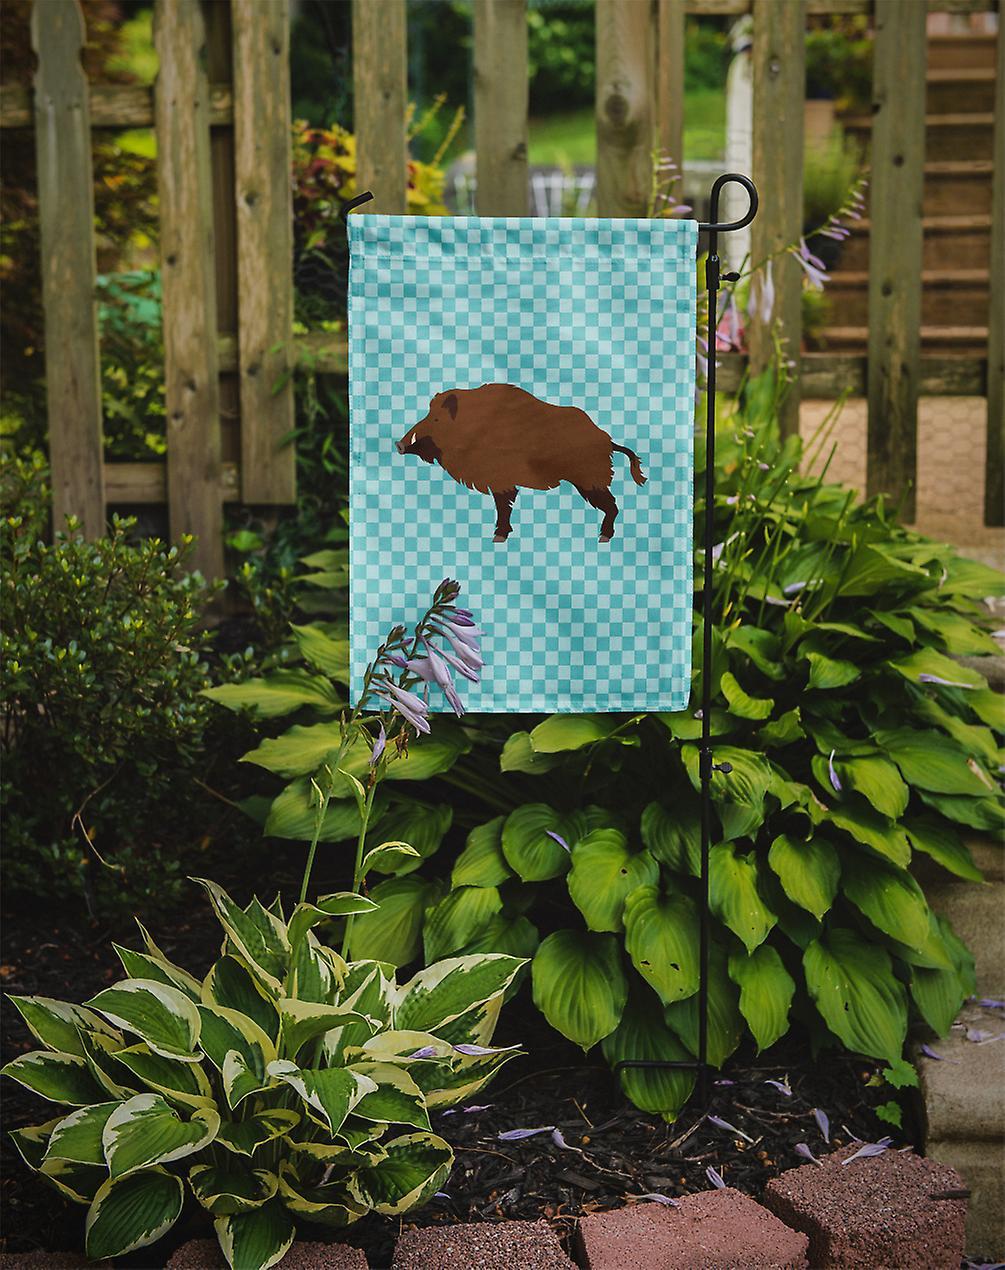 Carolines Treasures BB8110GF Wild Boar Pig Blue Check Flag Garden Size